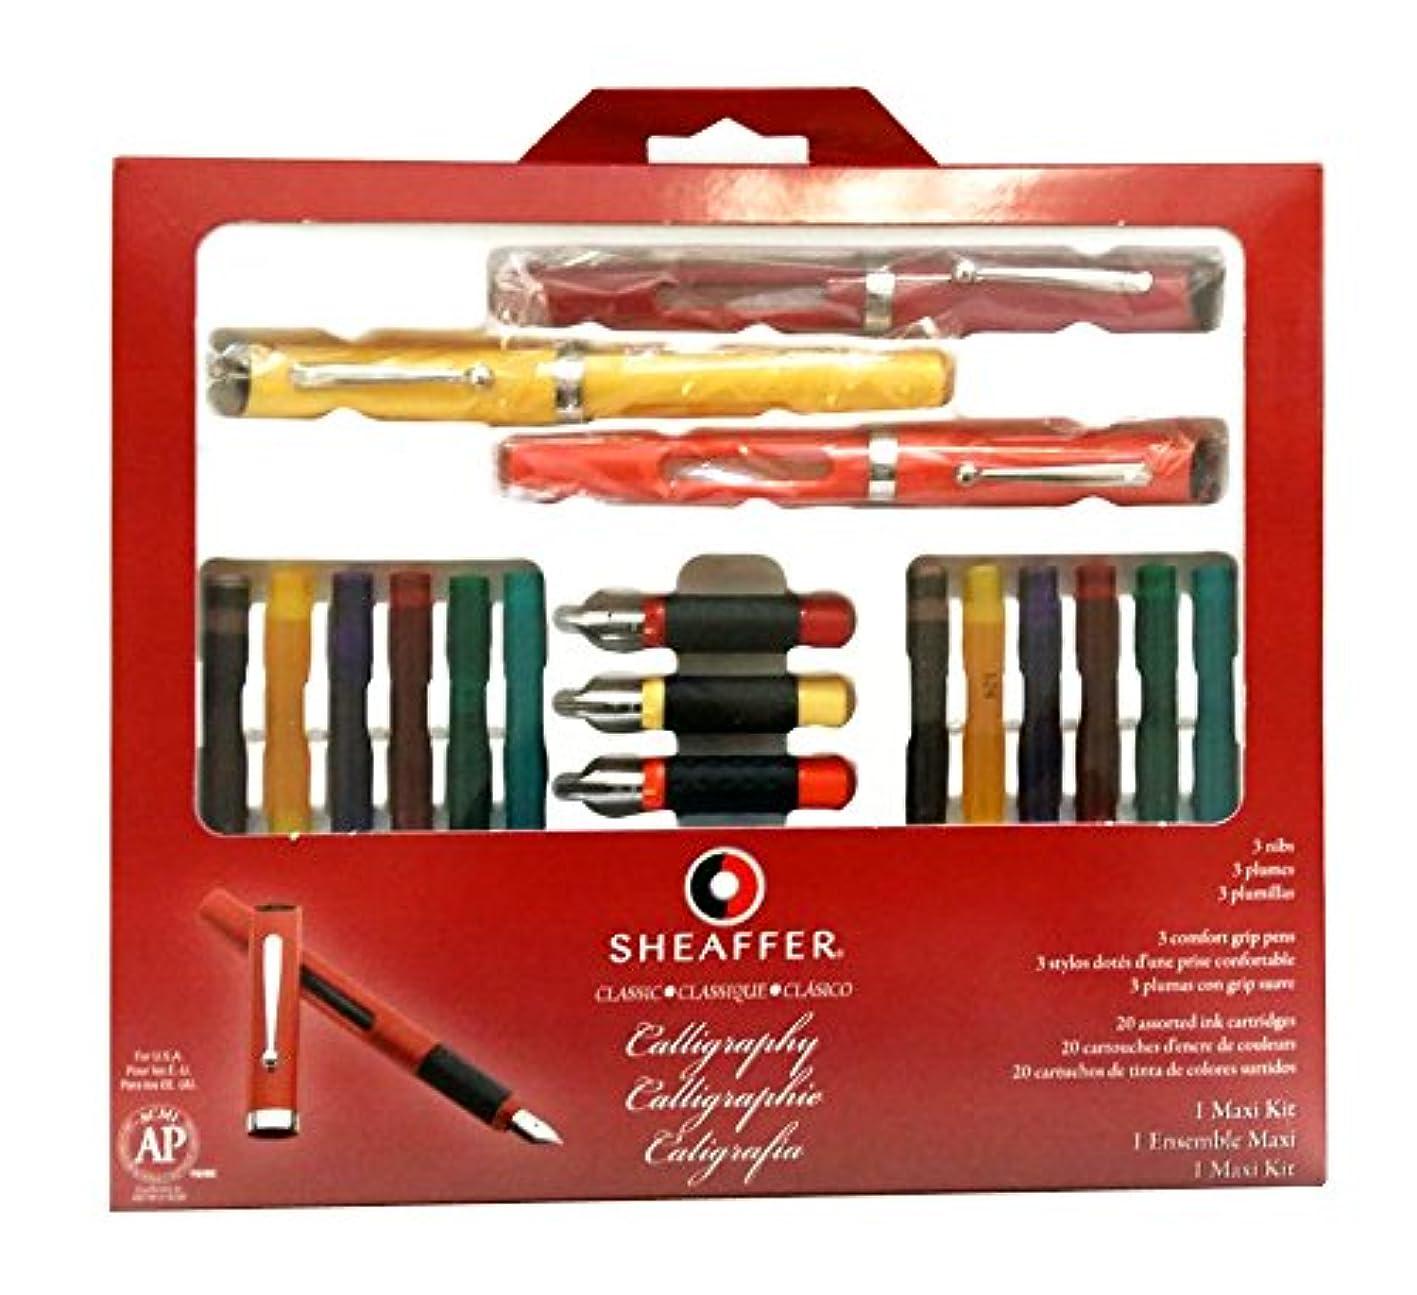 Sheaffer(R) Calligraphy Kit, Set Of 7 xtwboexcssv629